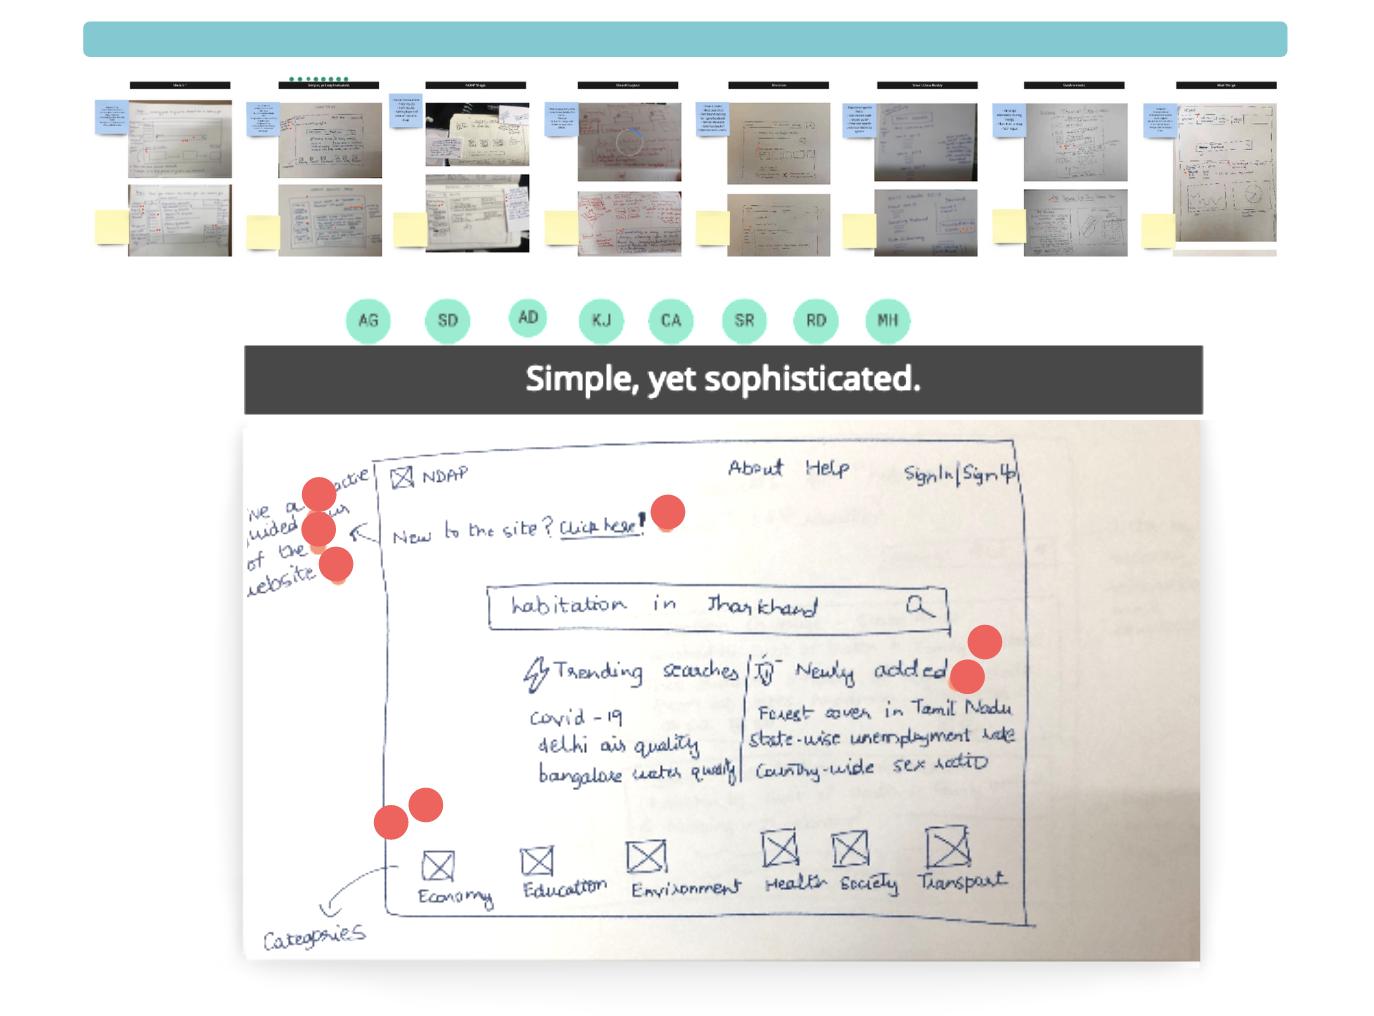 Design Sprint idea voting session